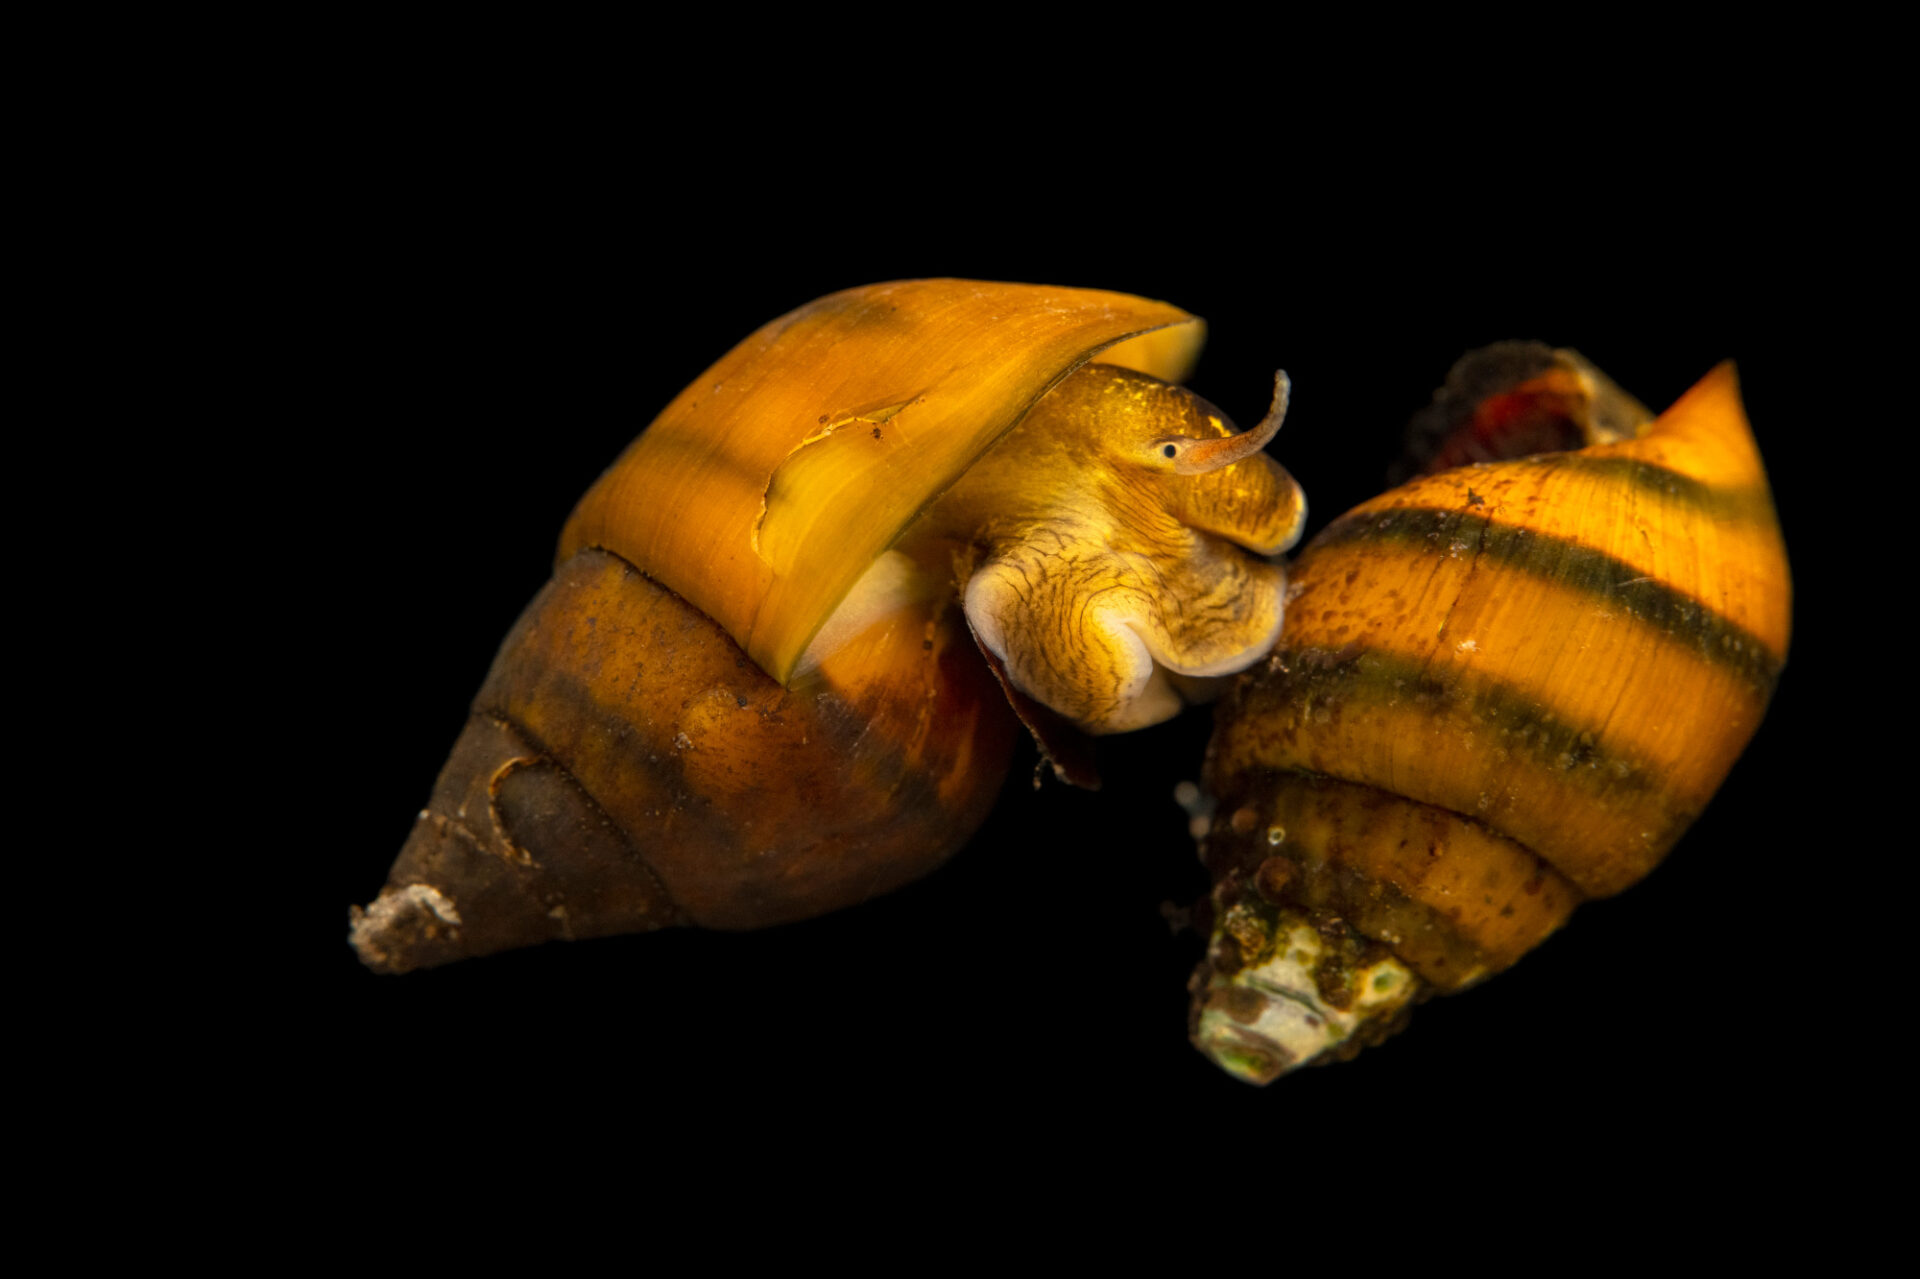 Photo: Two riffle elimia (Elimia clara) photographed at the Alabama Aquatic Biodiversity Center in Marion, AL.